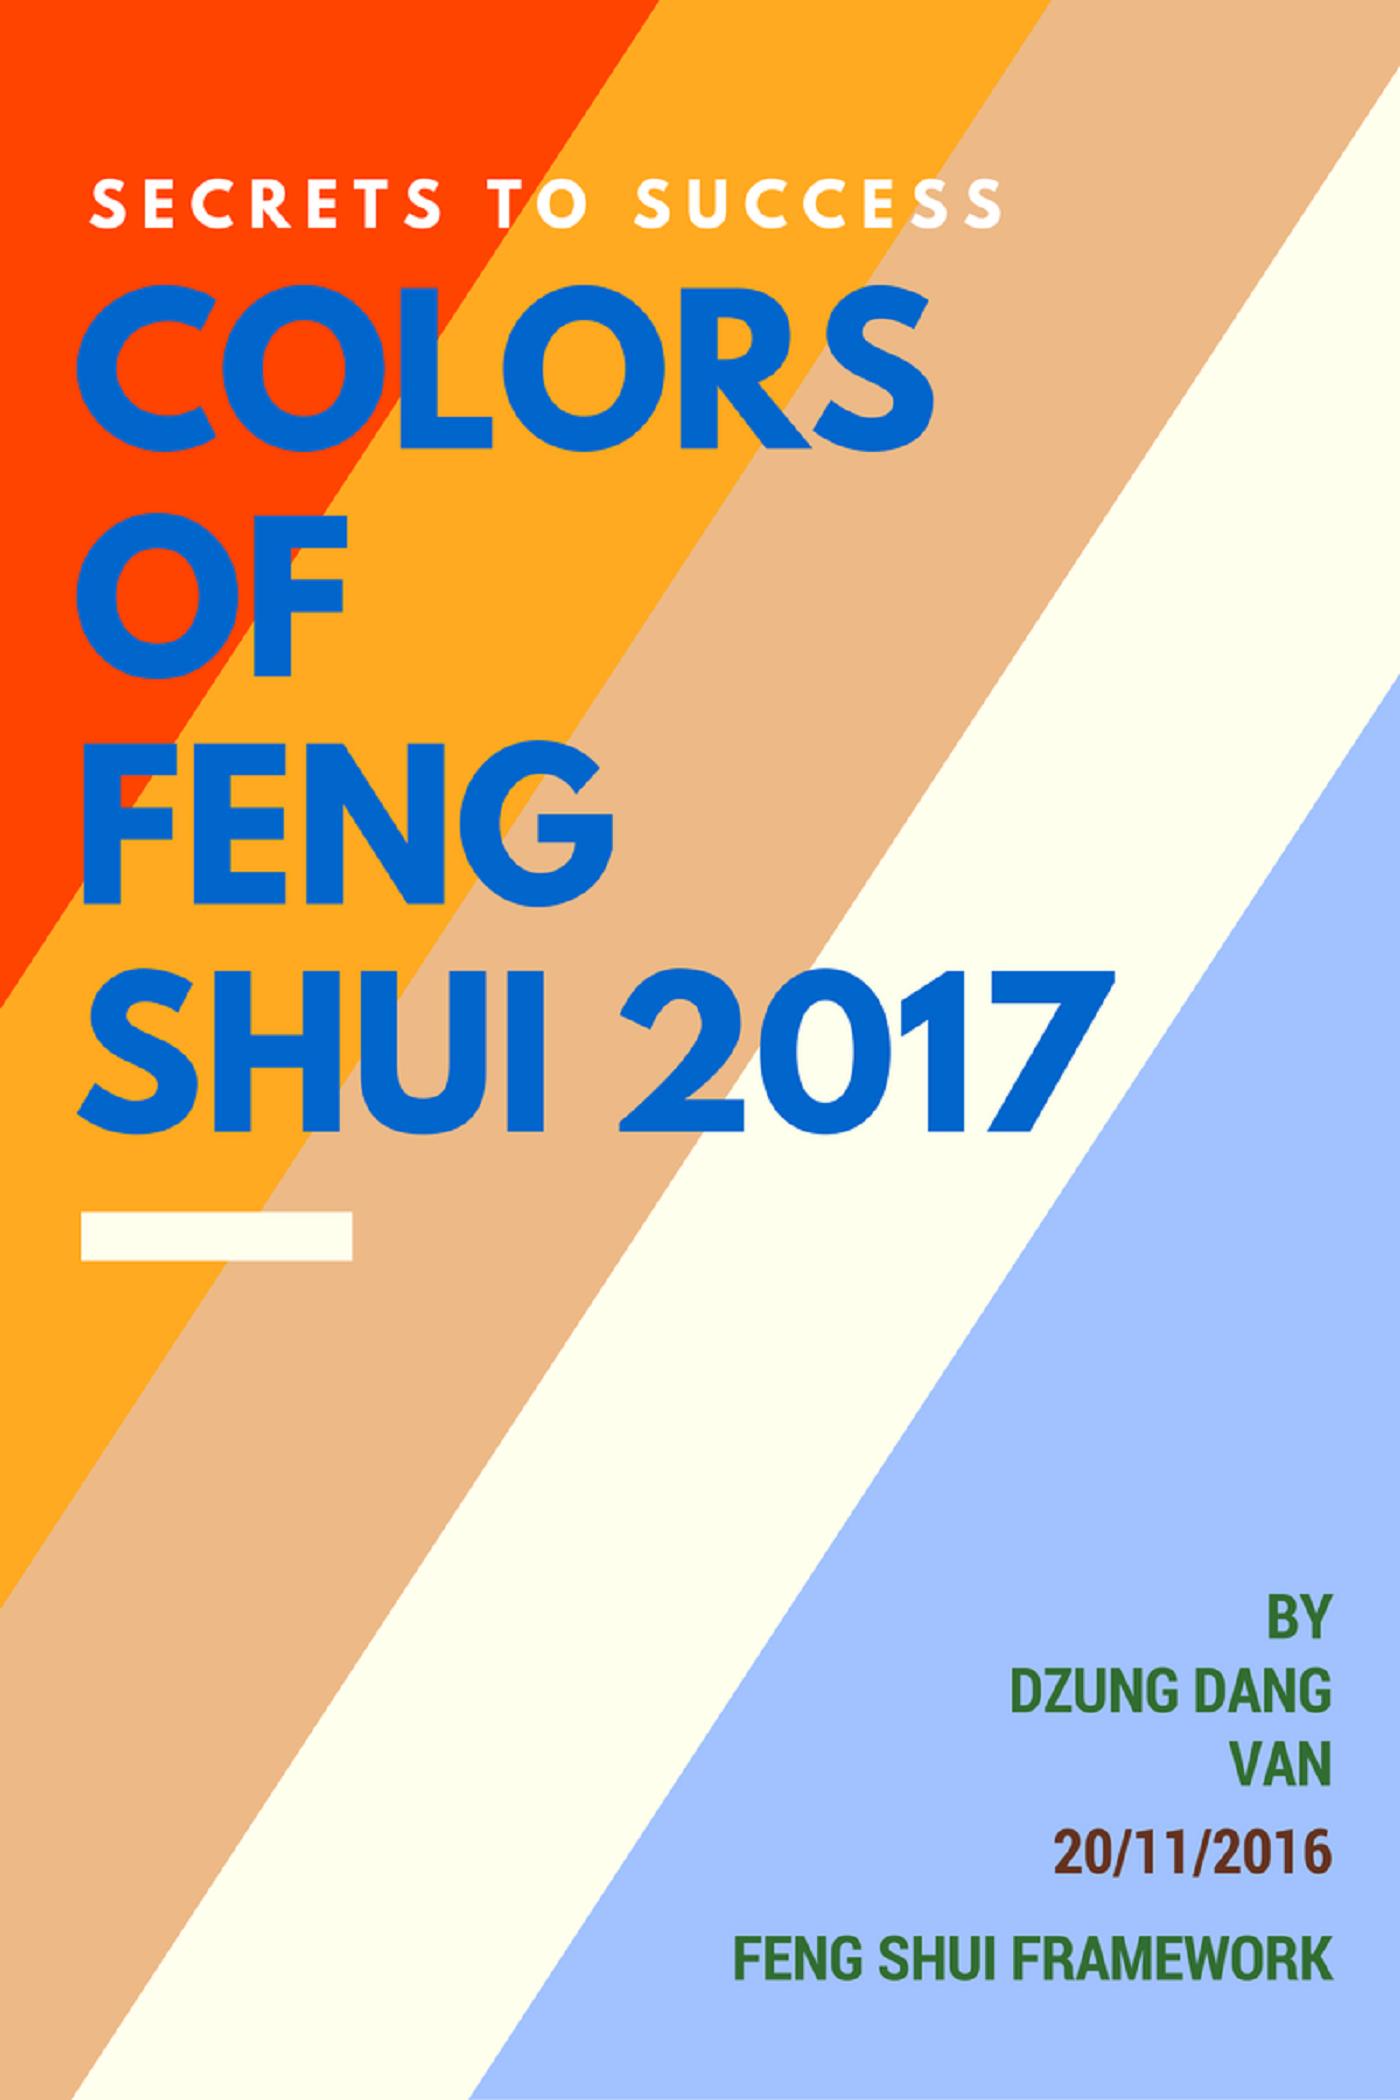 smashwords secrets to success colors of feng shui 2017 a book